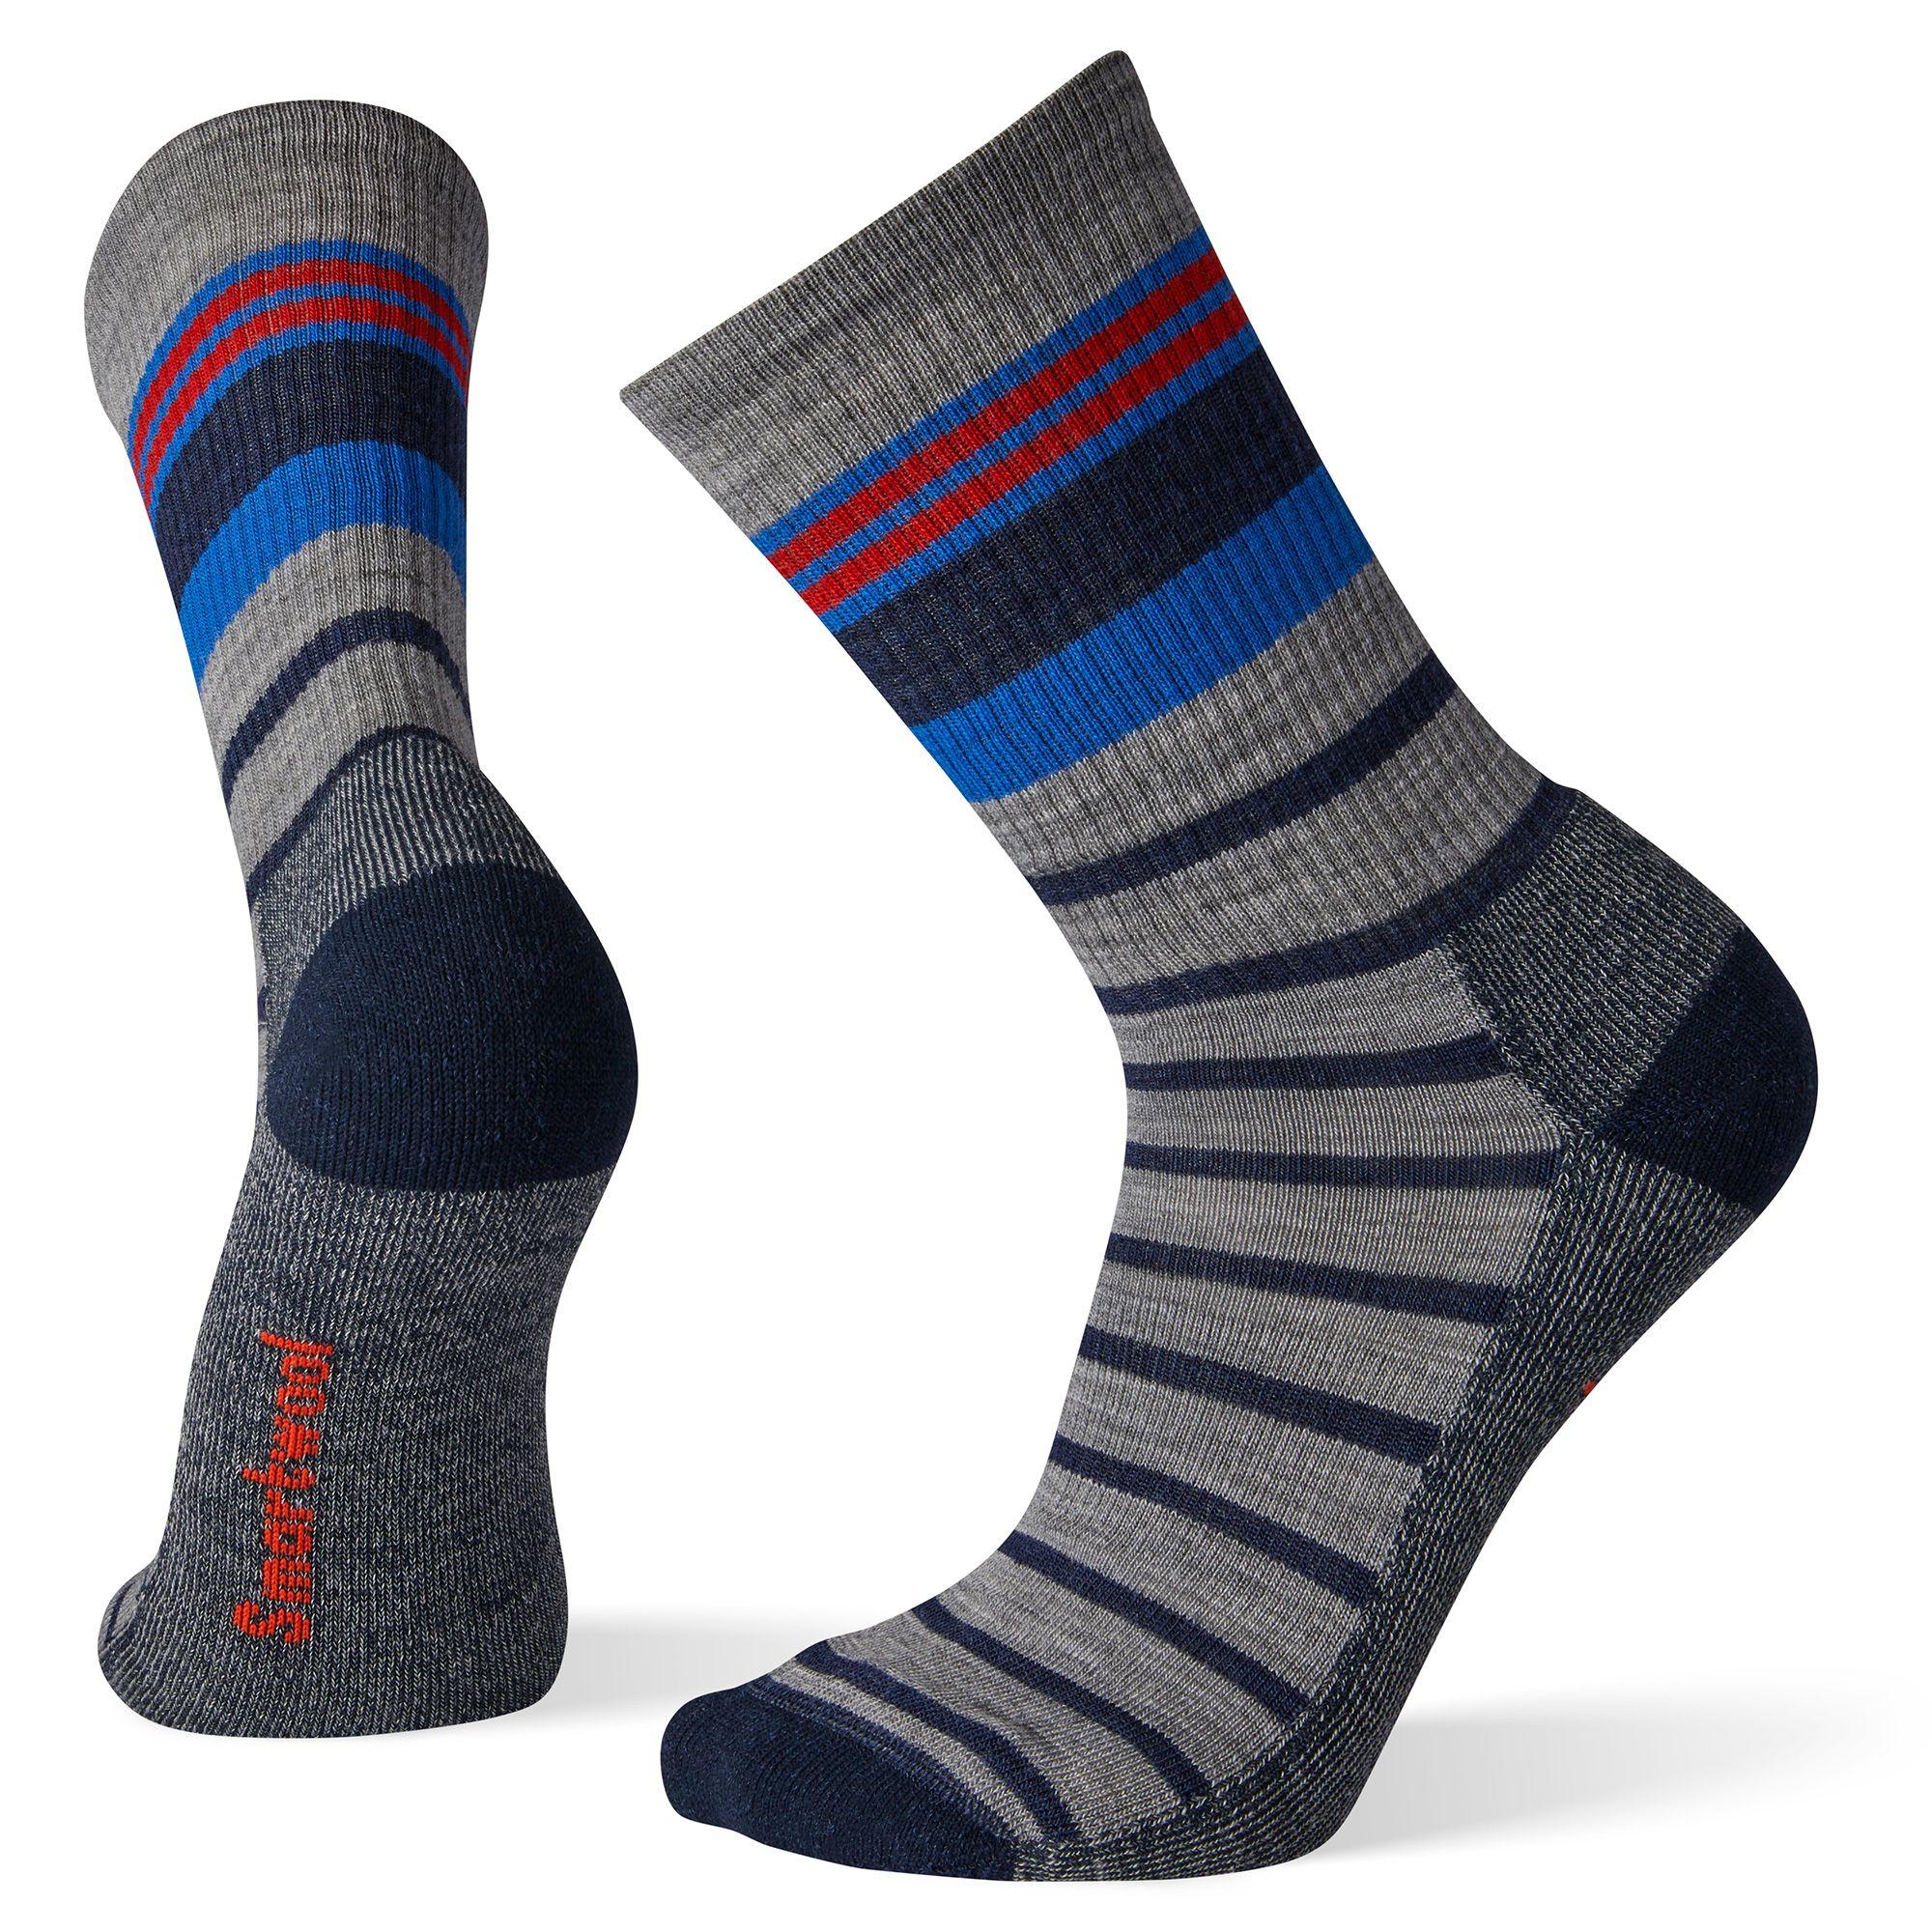 Hike Light Striped Crew Socks